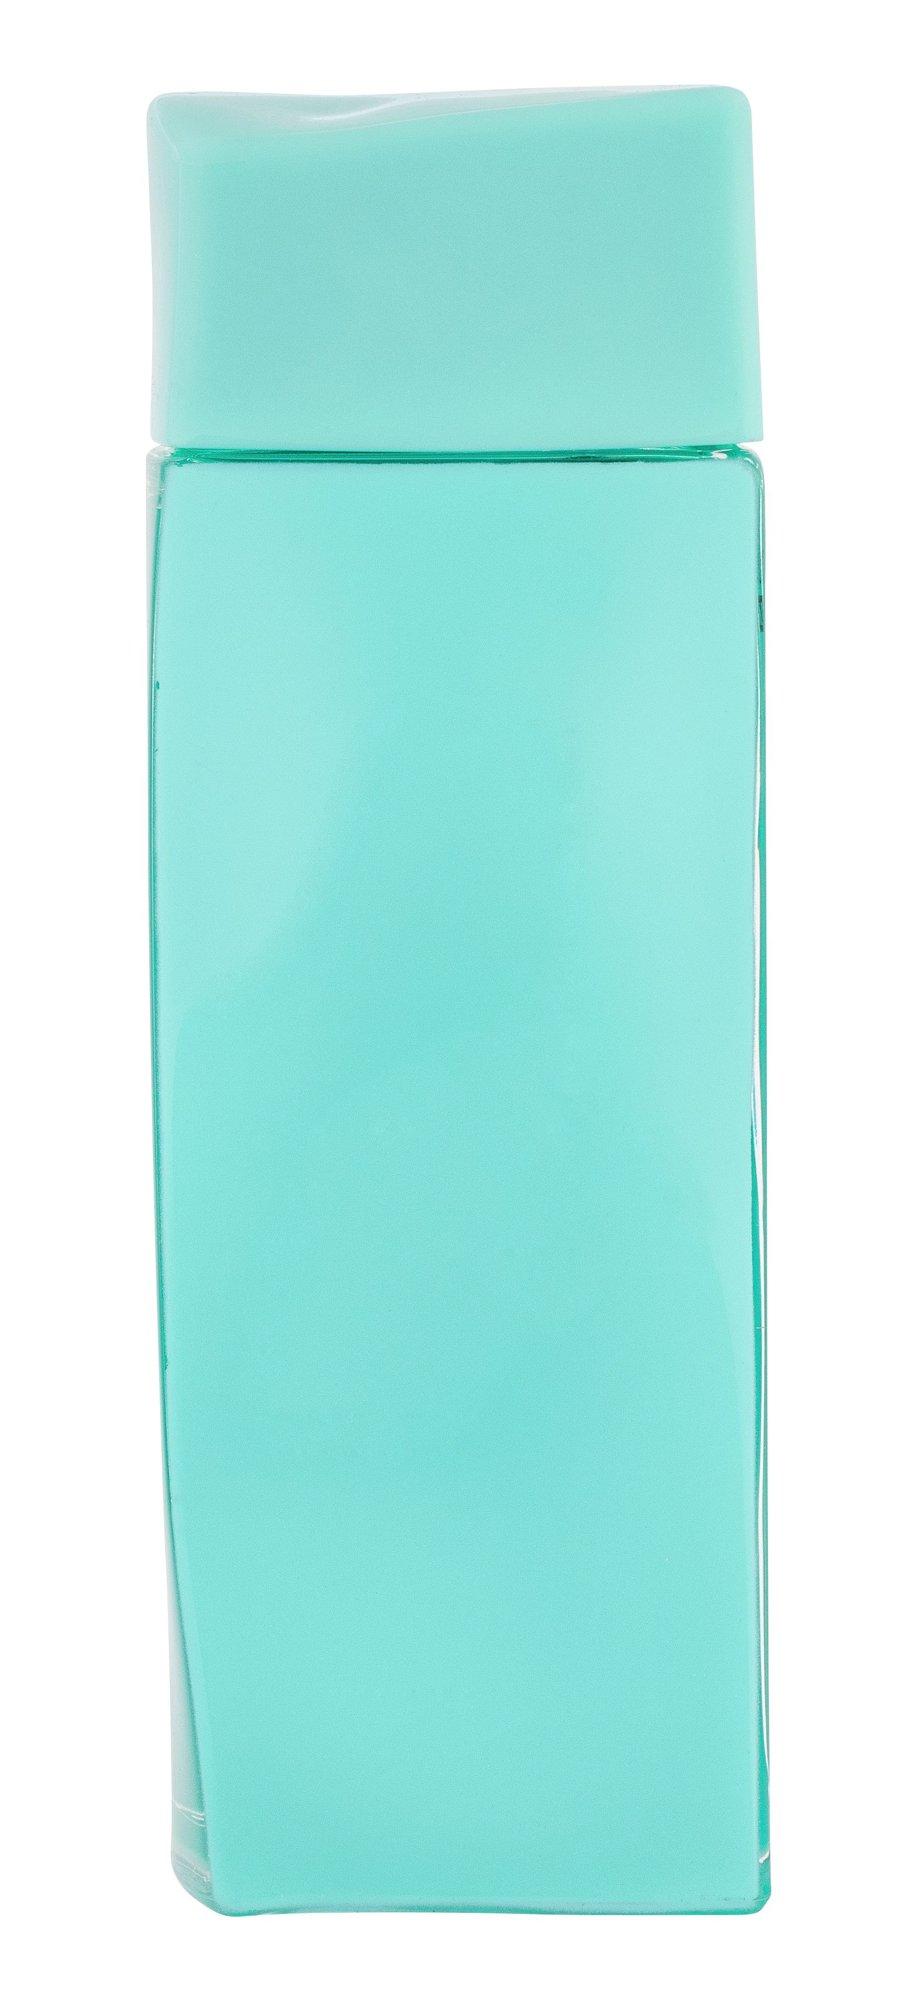 KENZO Aqua Kenzo pour Femme, Toaletní voda 100ml